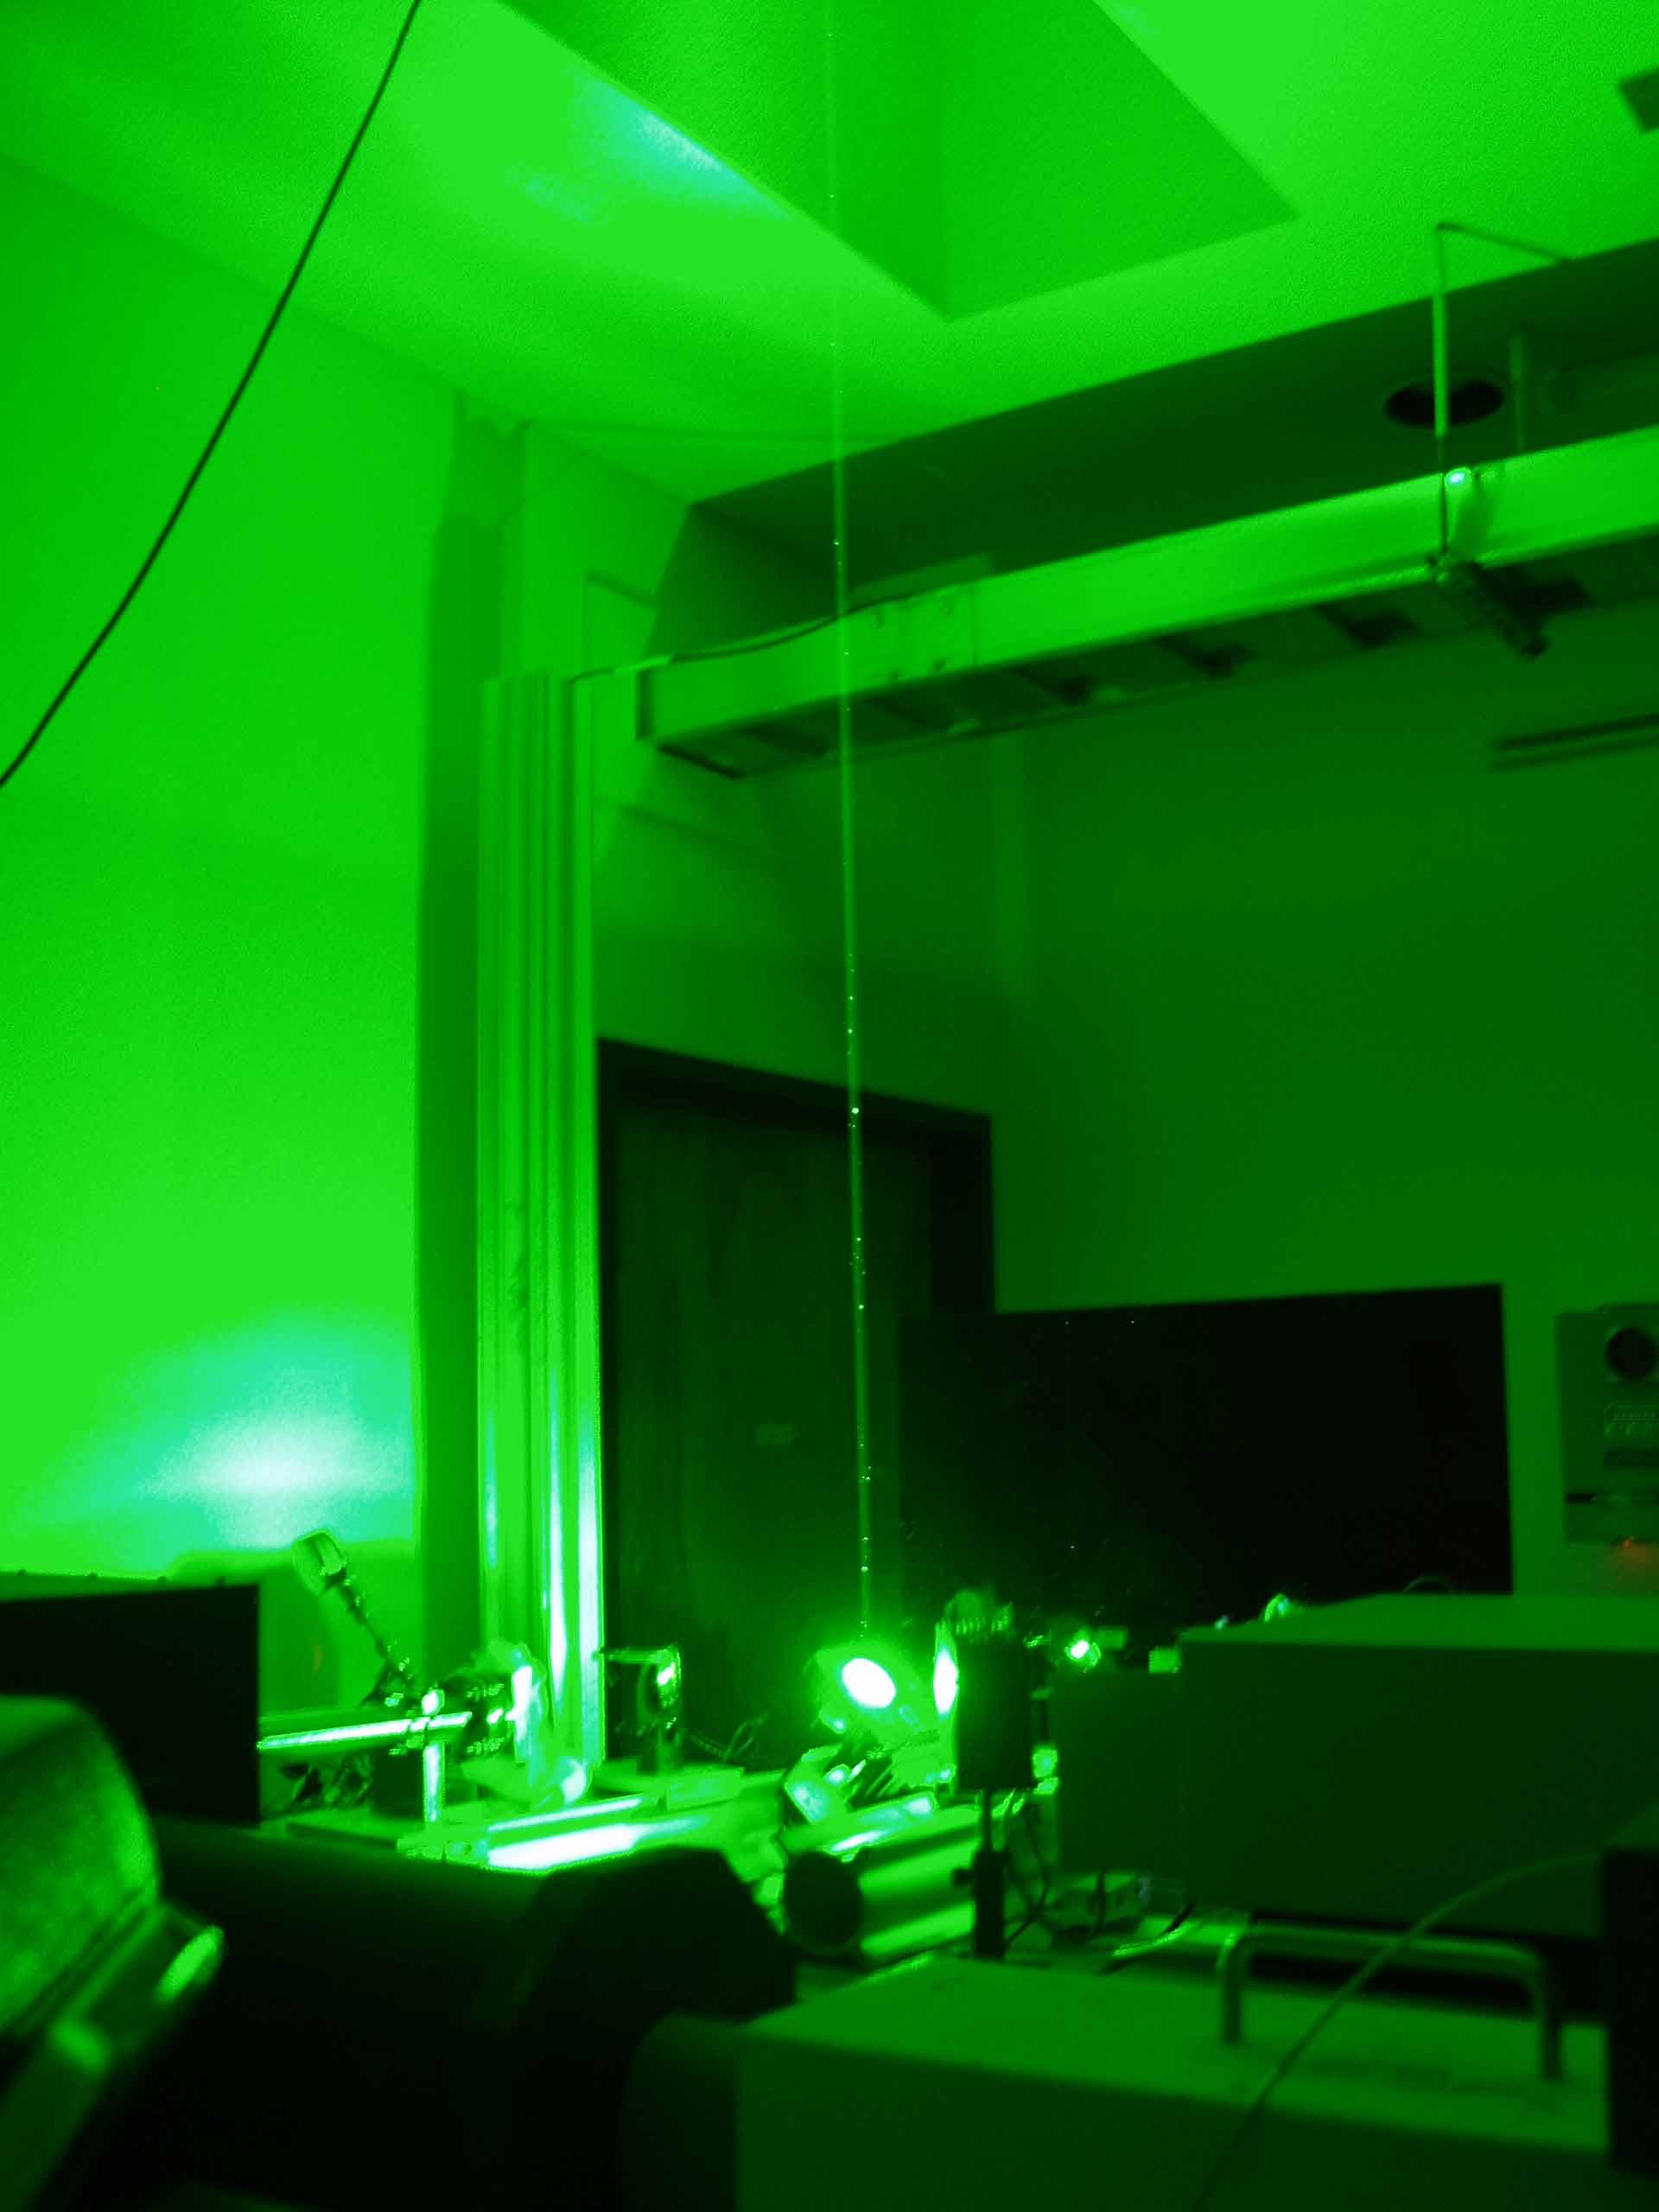 Esrl Global Monitoring Division Mauna Loa Observatory Mlo Wiring Diagram Lidar Ndyag Laser